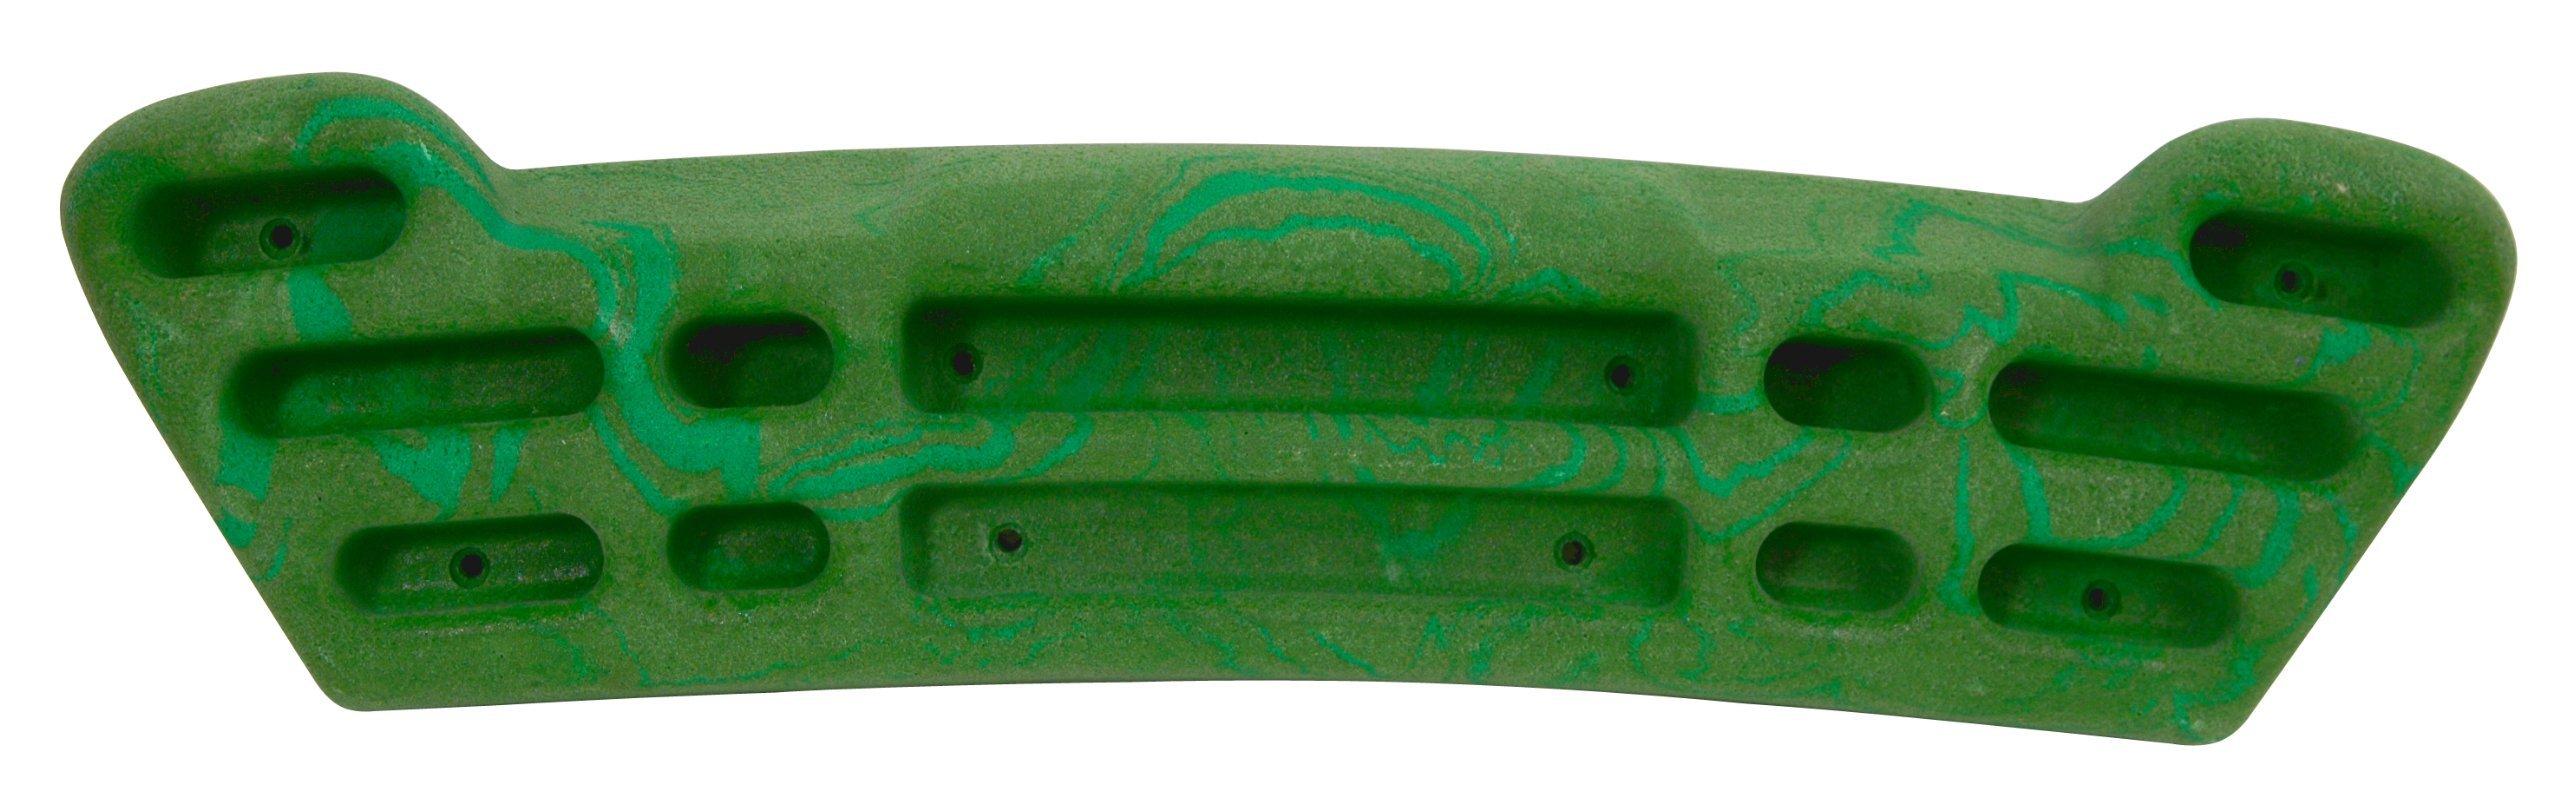 Metolius Project Training Board Green / Green Swirl One Size